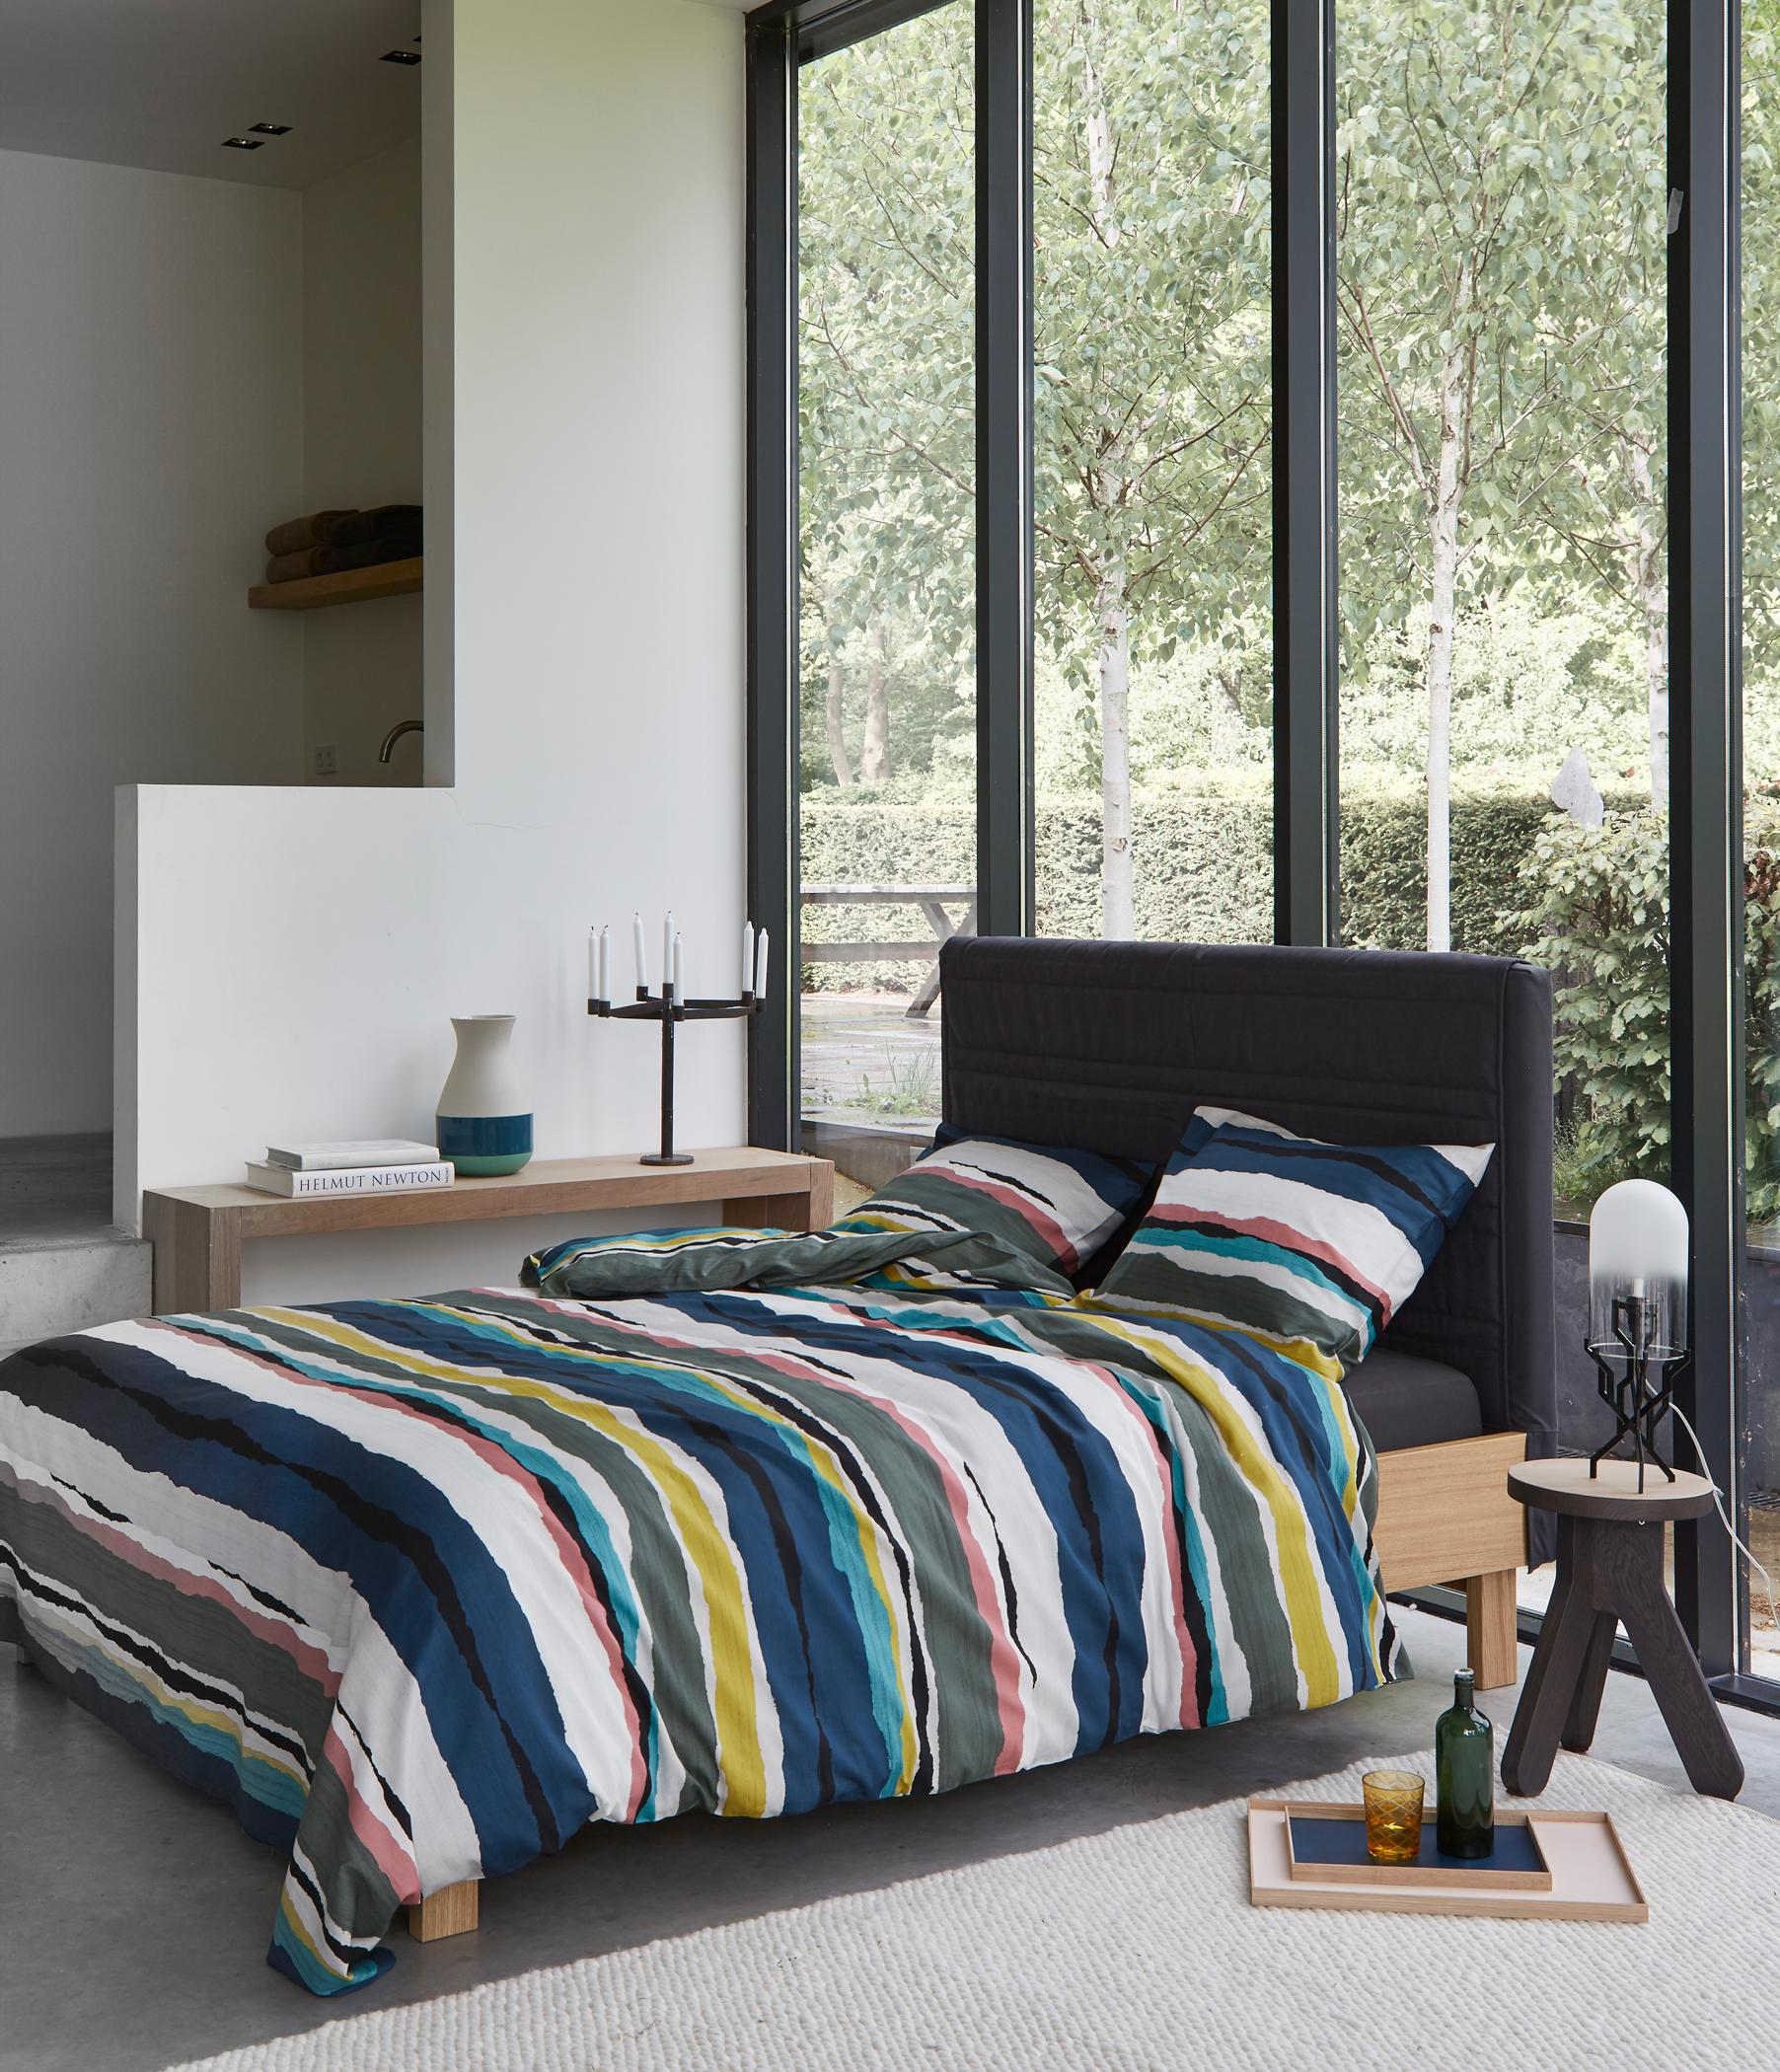 bunte bettw sche bilder ideen couchstyle. Black Bedroom Furniture Sets. Home Design Ideas